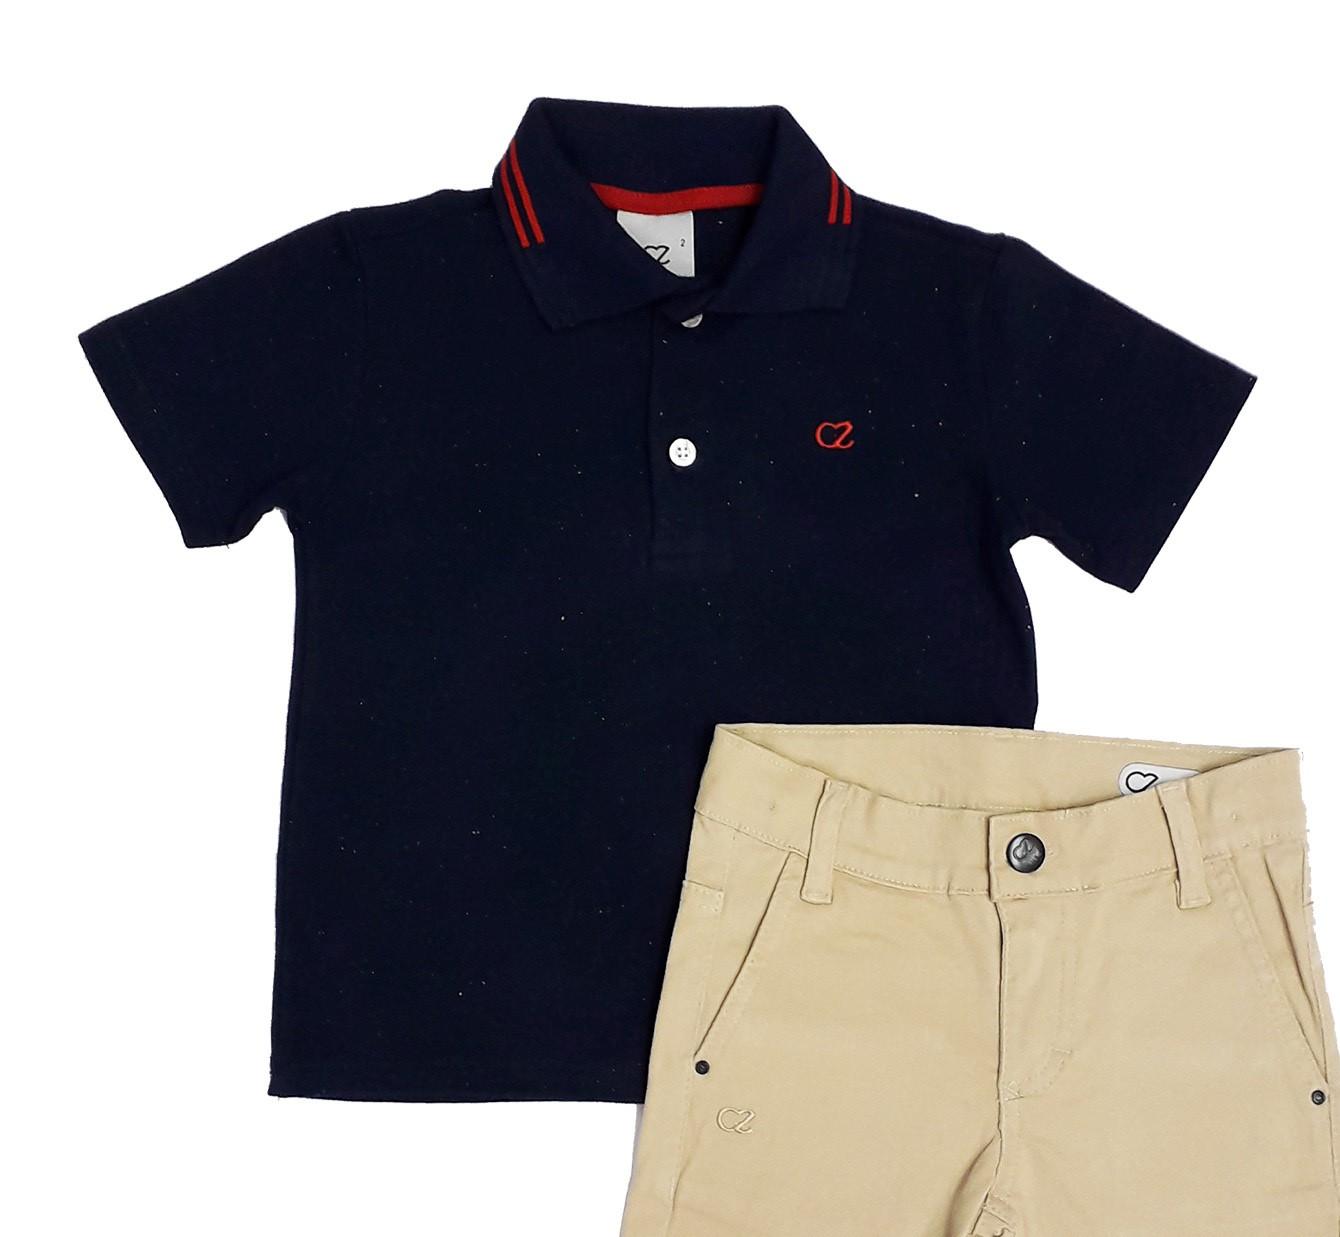 Conjunto Infantil de Polo Azul com Bermuda Sarja  Club Z